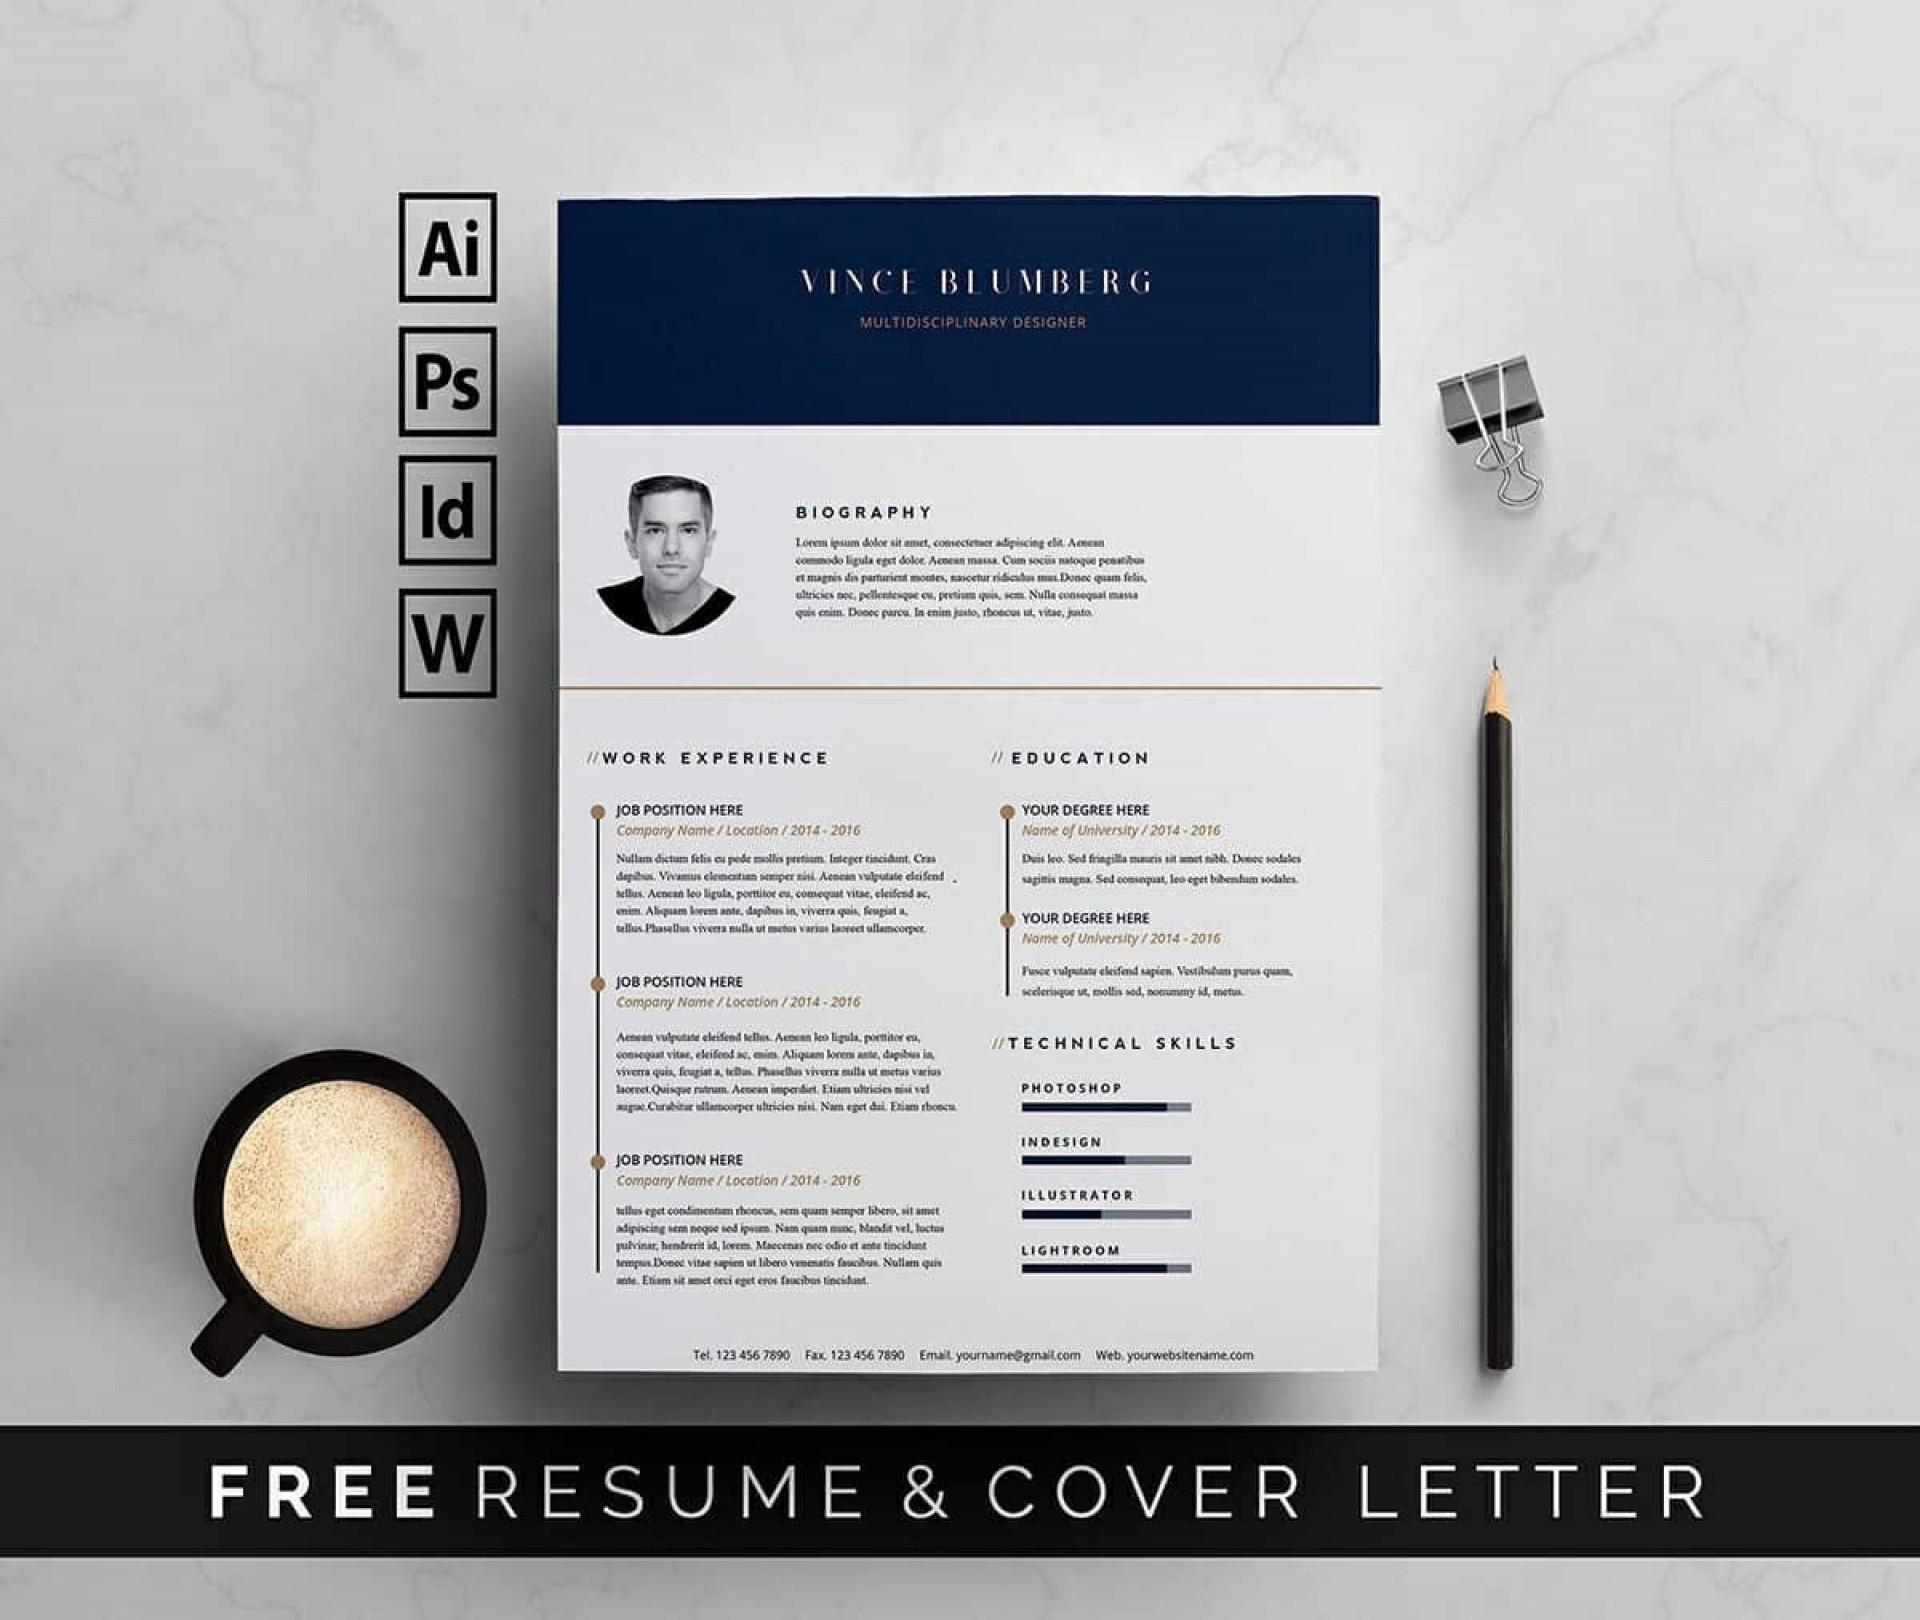 012 Stupendou Curriculum Vitae Template Free Word Sample  Format Microsoft Cv Download1920